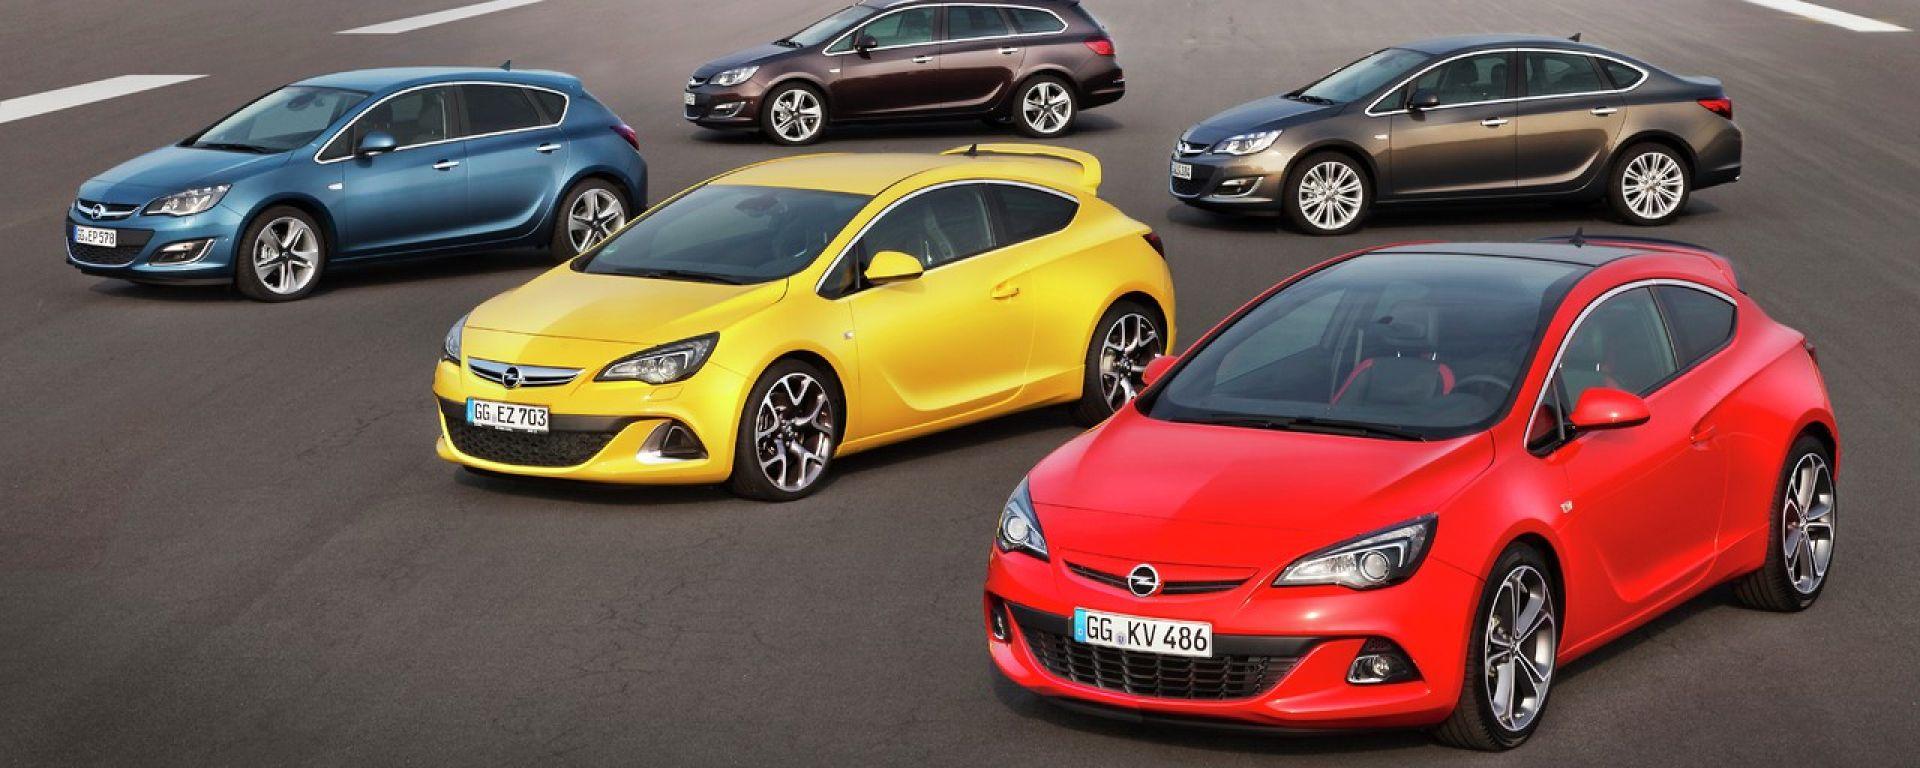 Opel Astra MY 2013